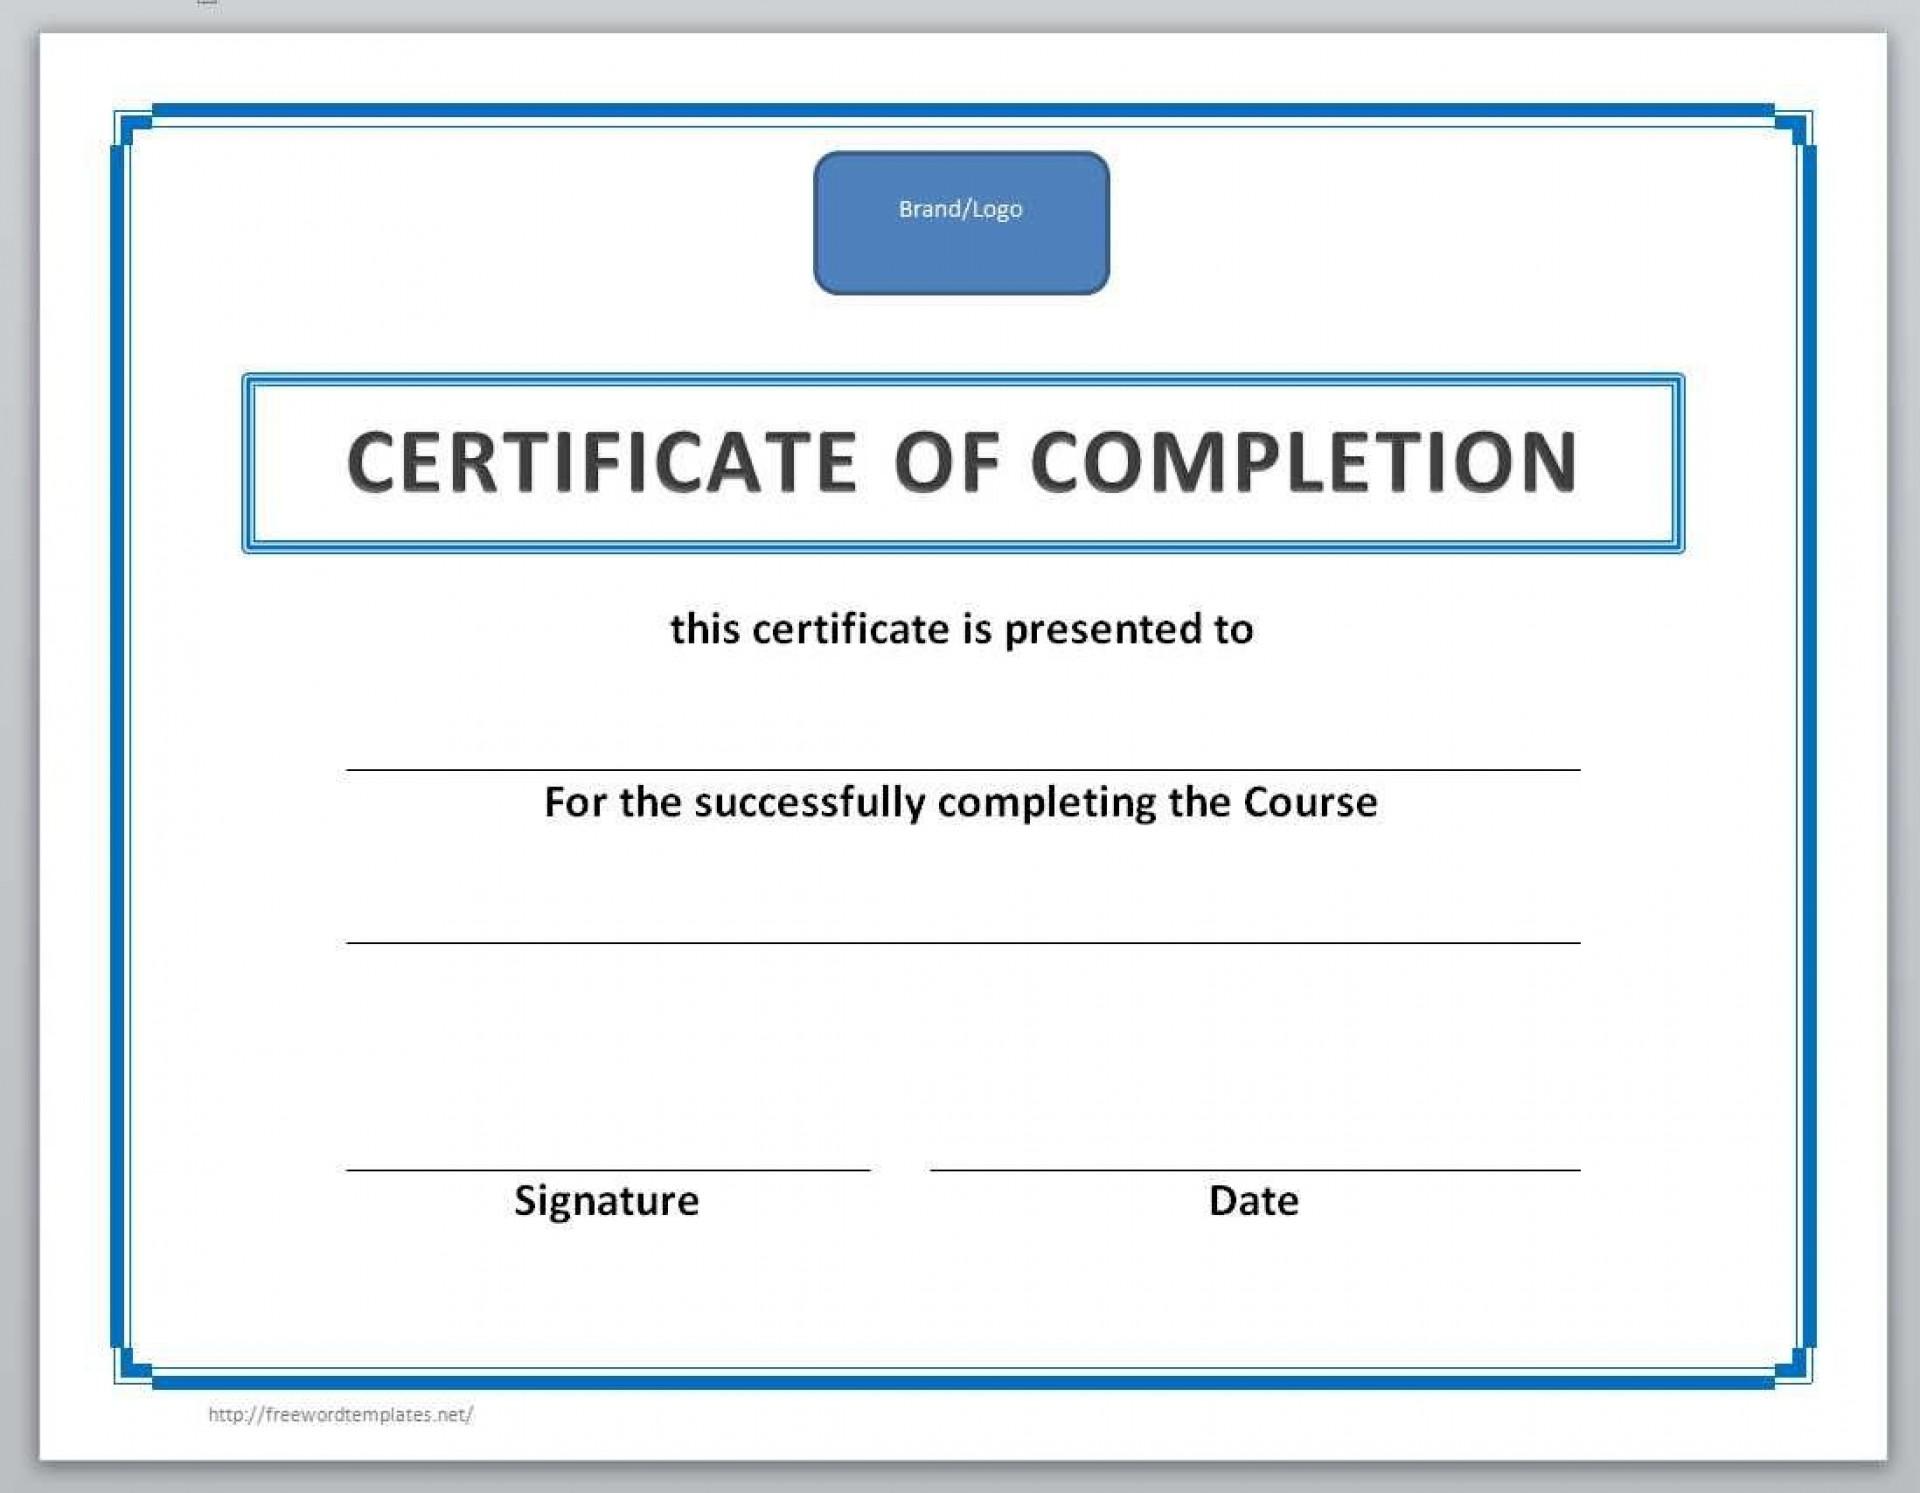 005 Striking Free Certificate Template Word Download Image  Of Appreciation Doc Award Border1920